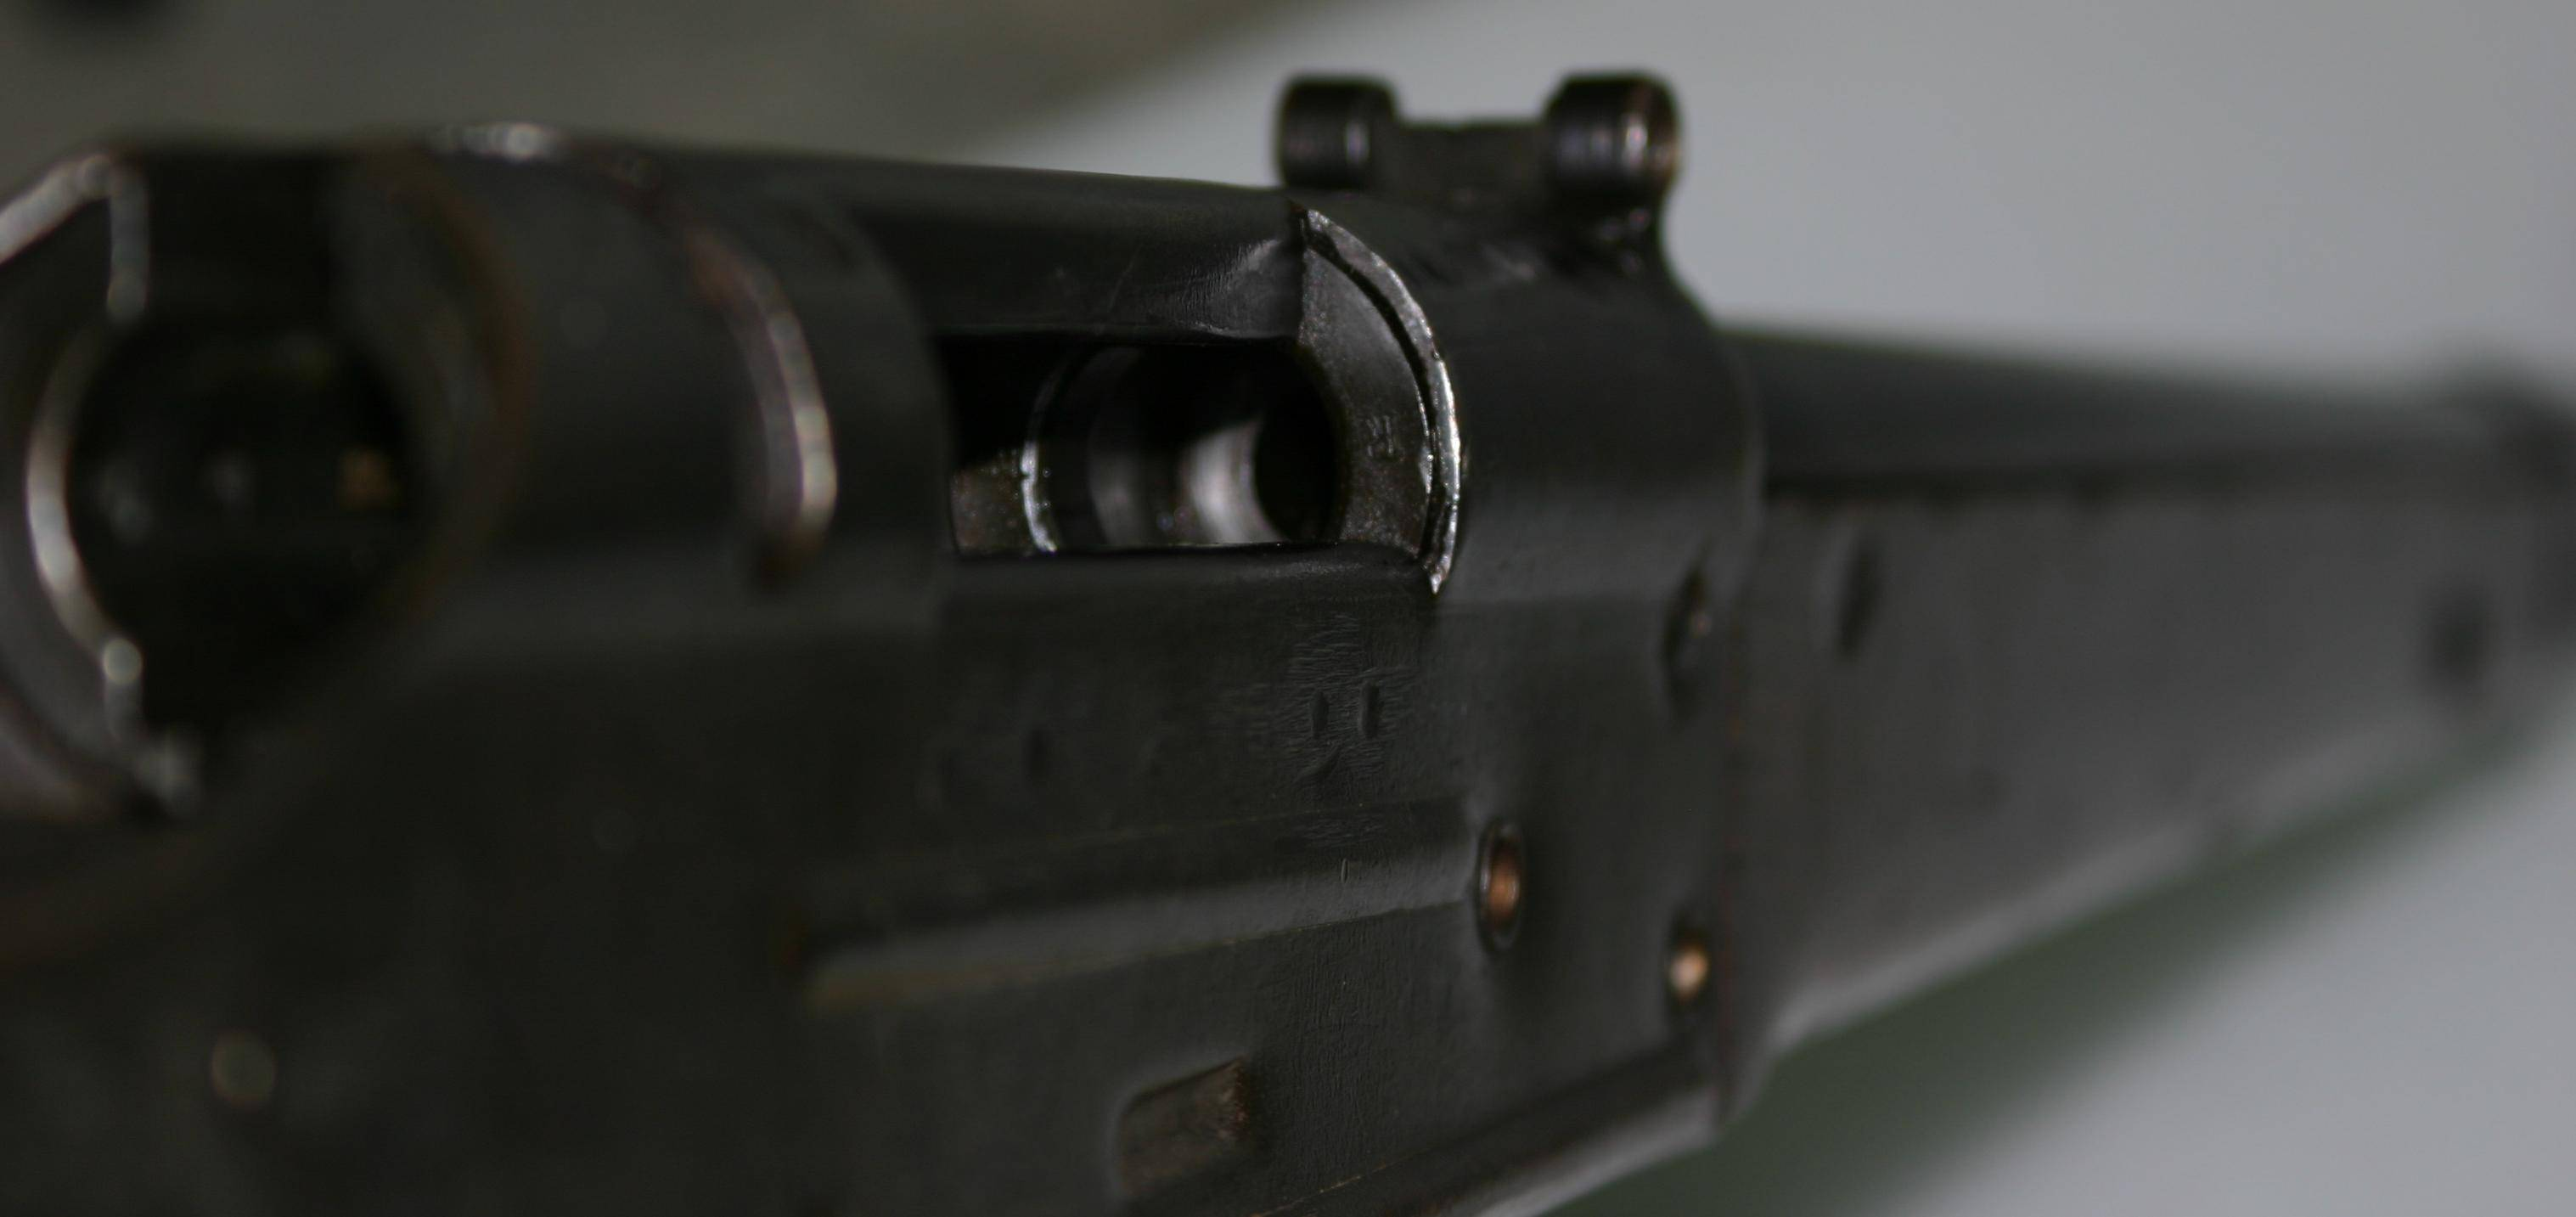 Volkssturmgewehr - volkssturmgewehr